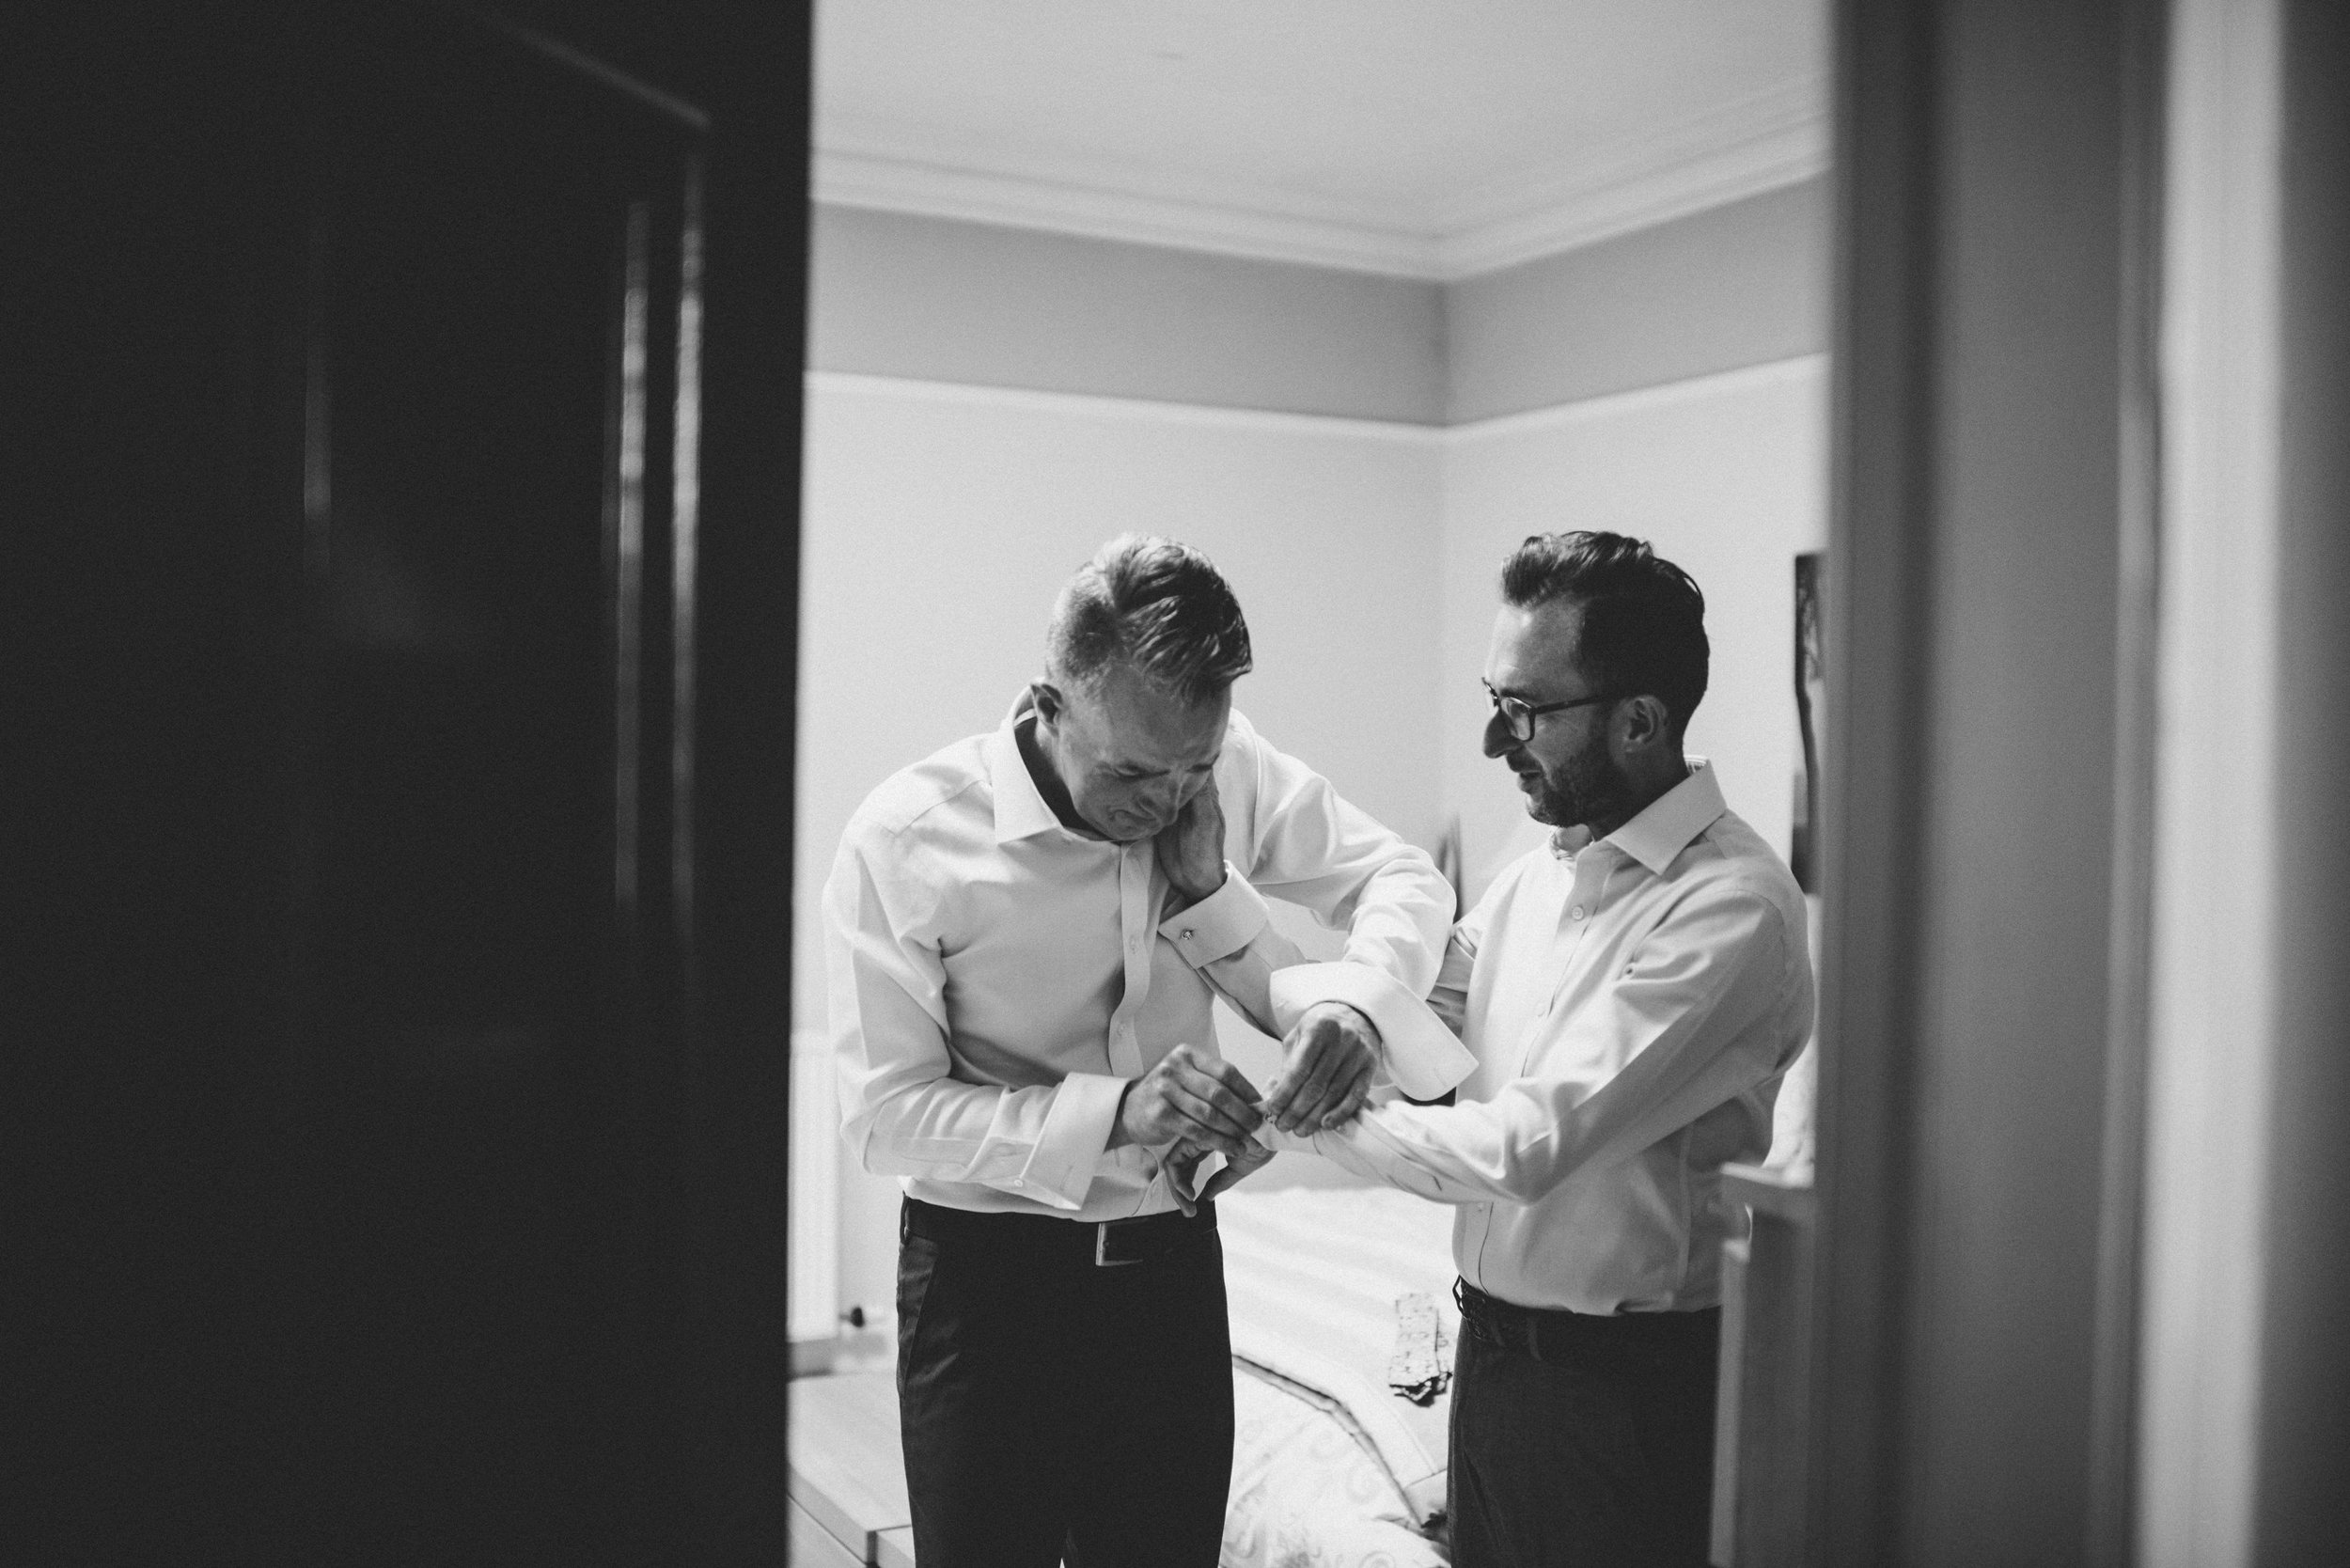 0056-LISA-DEVINE-PHOTOGRAPHY-ALTERNATIVE-WEDDING-PHOTOGRAPHY-SCOTLAND-DESTINATION-WEDDINGS-GLASGOW-WEDDINGS-COOL-WEDDINGS-STYLISH-WEDDINGS.JPG